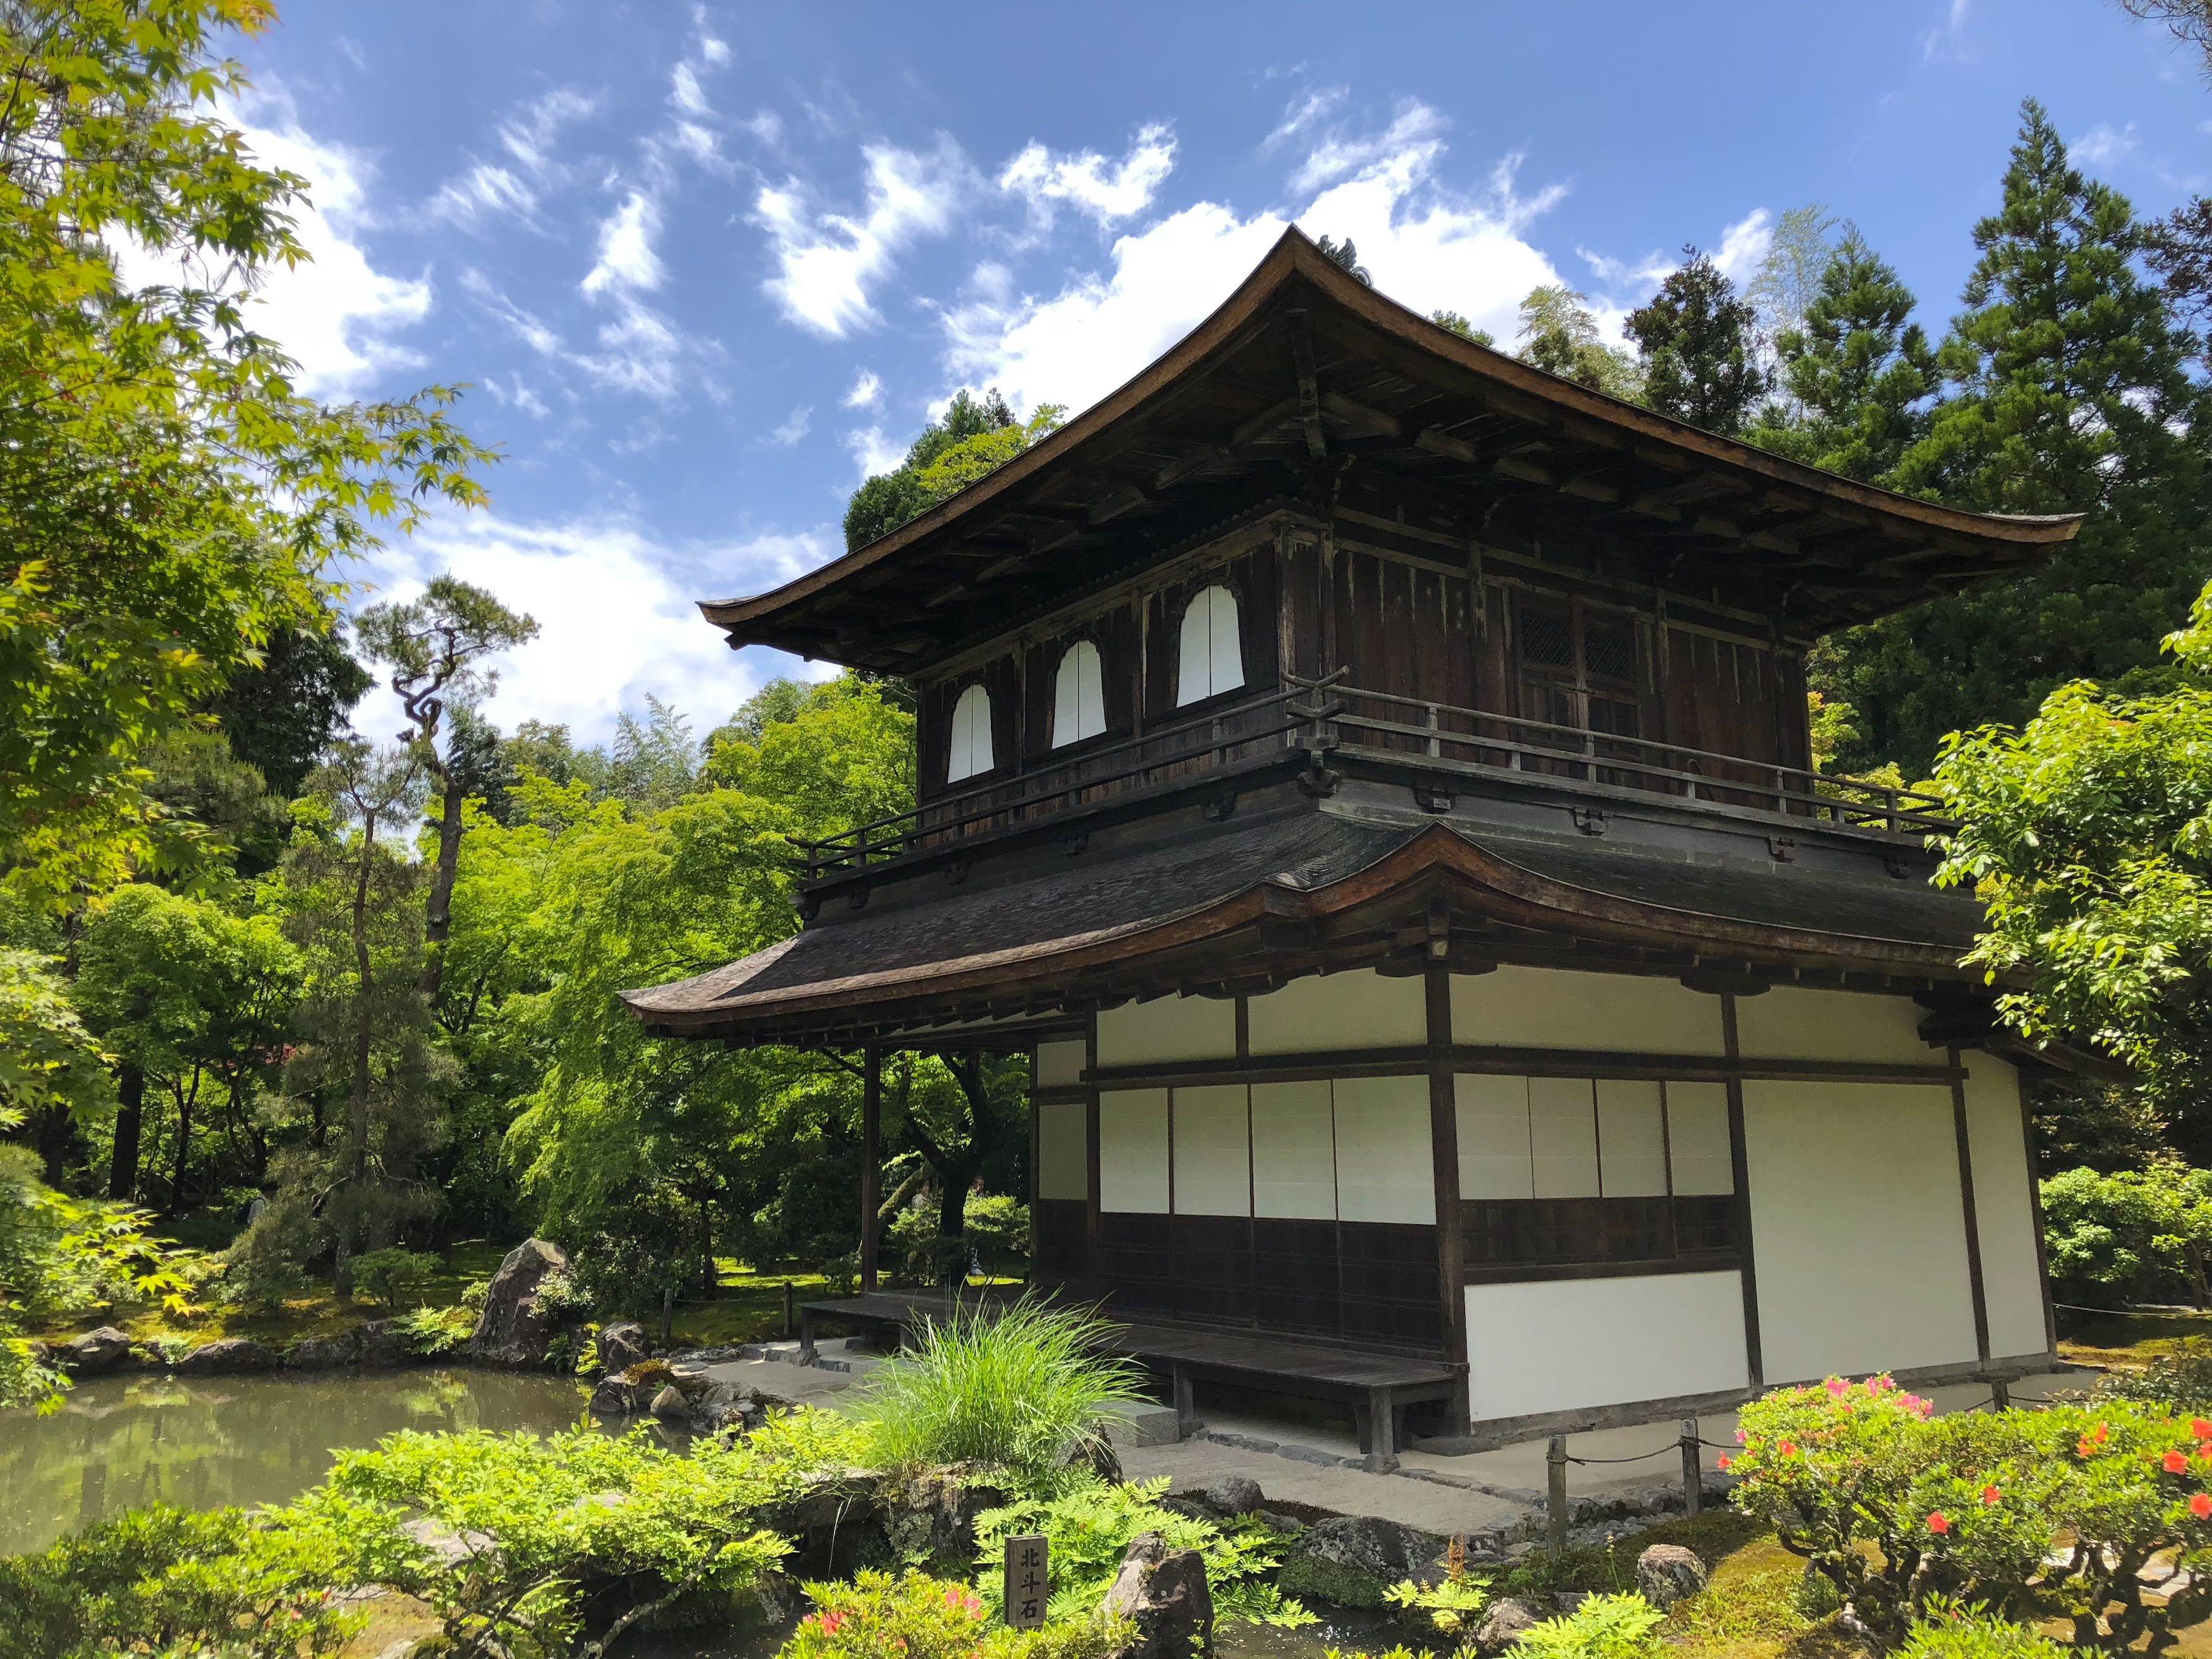 Day 39 〝銀閣寺と哲学の道〟【日本一周の旅】